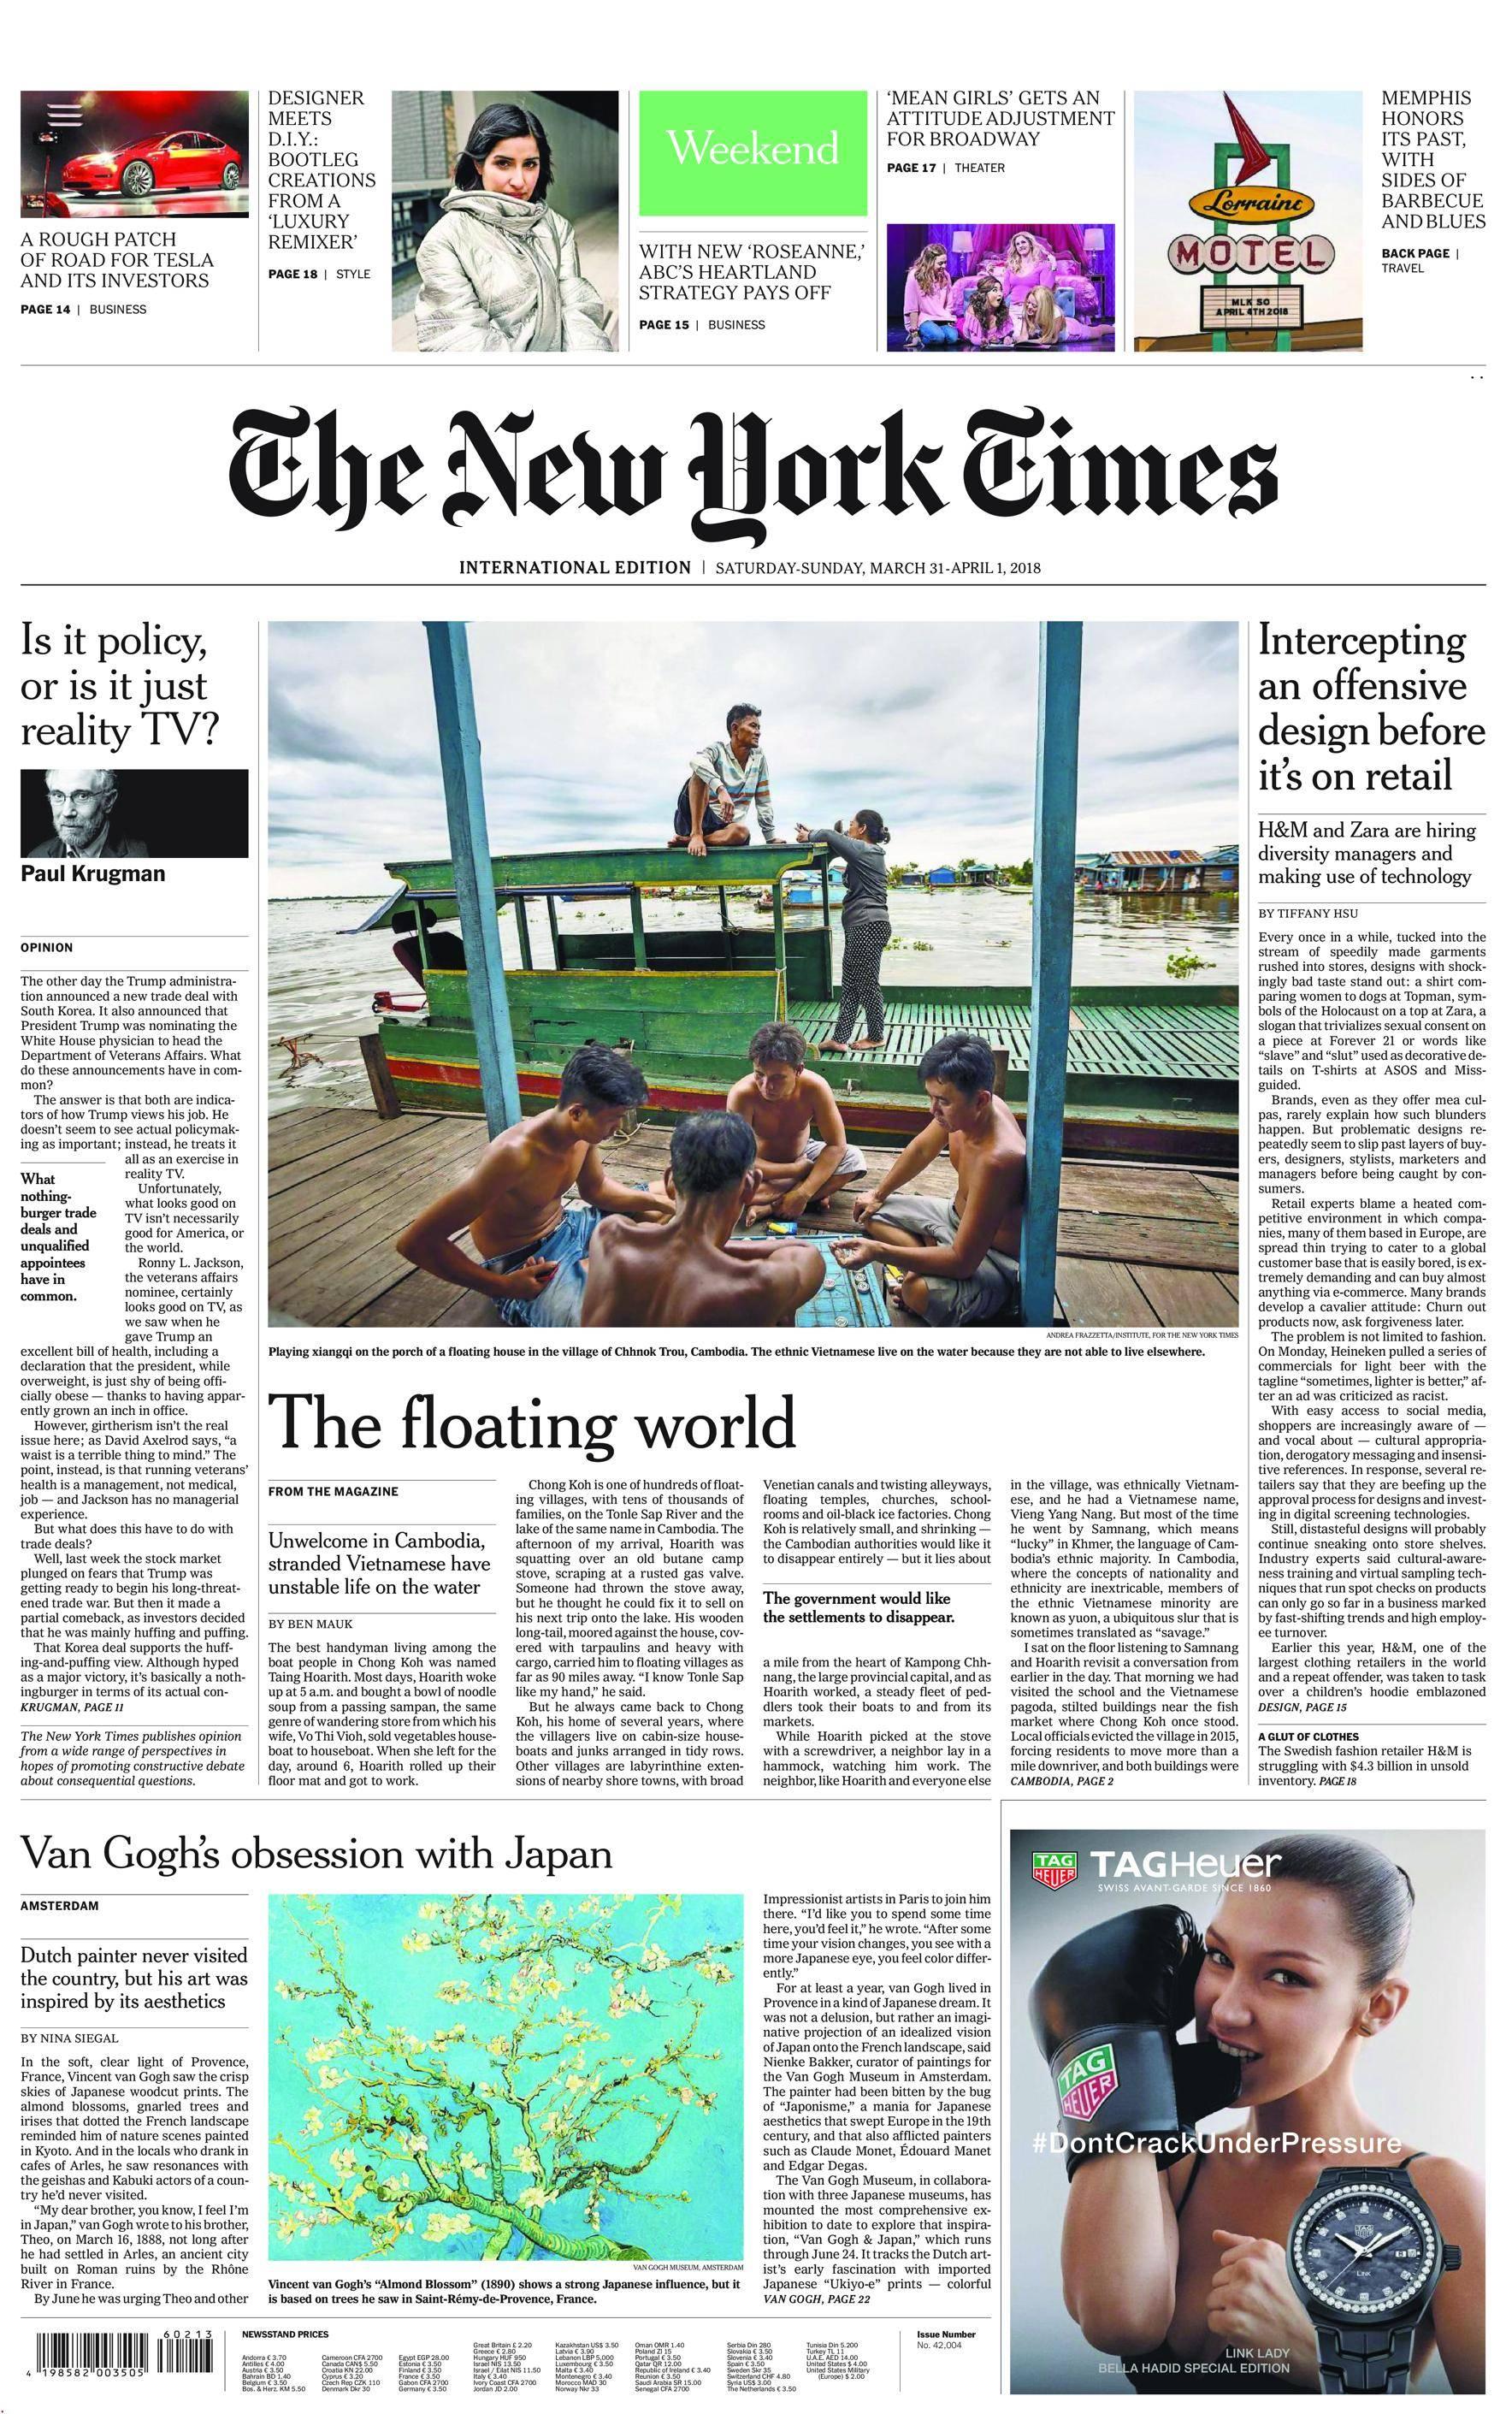 International New York Times - 31 March 2018